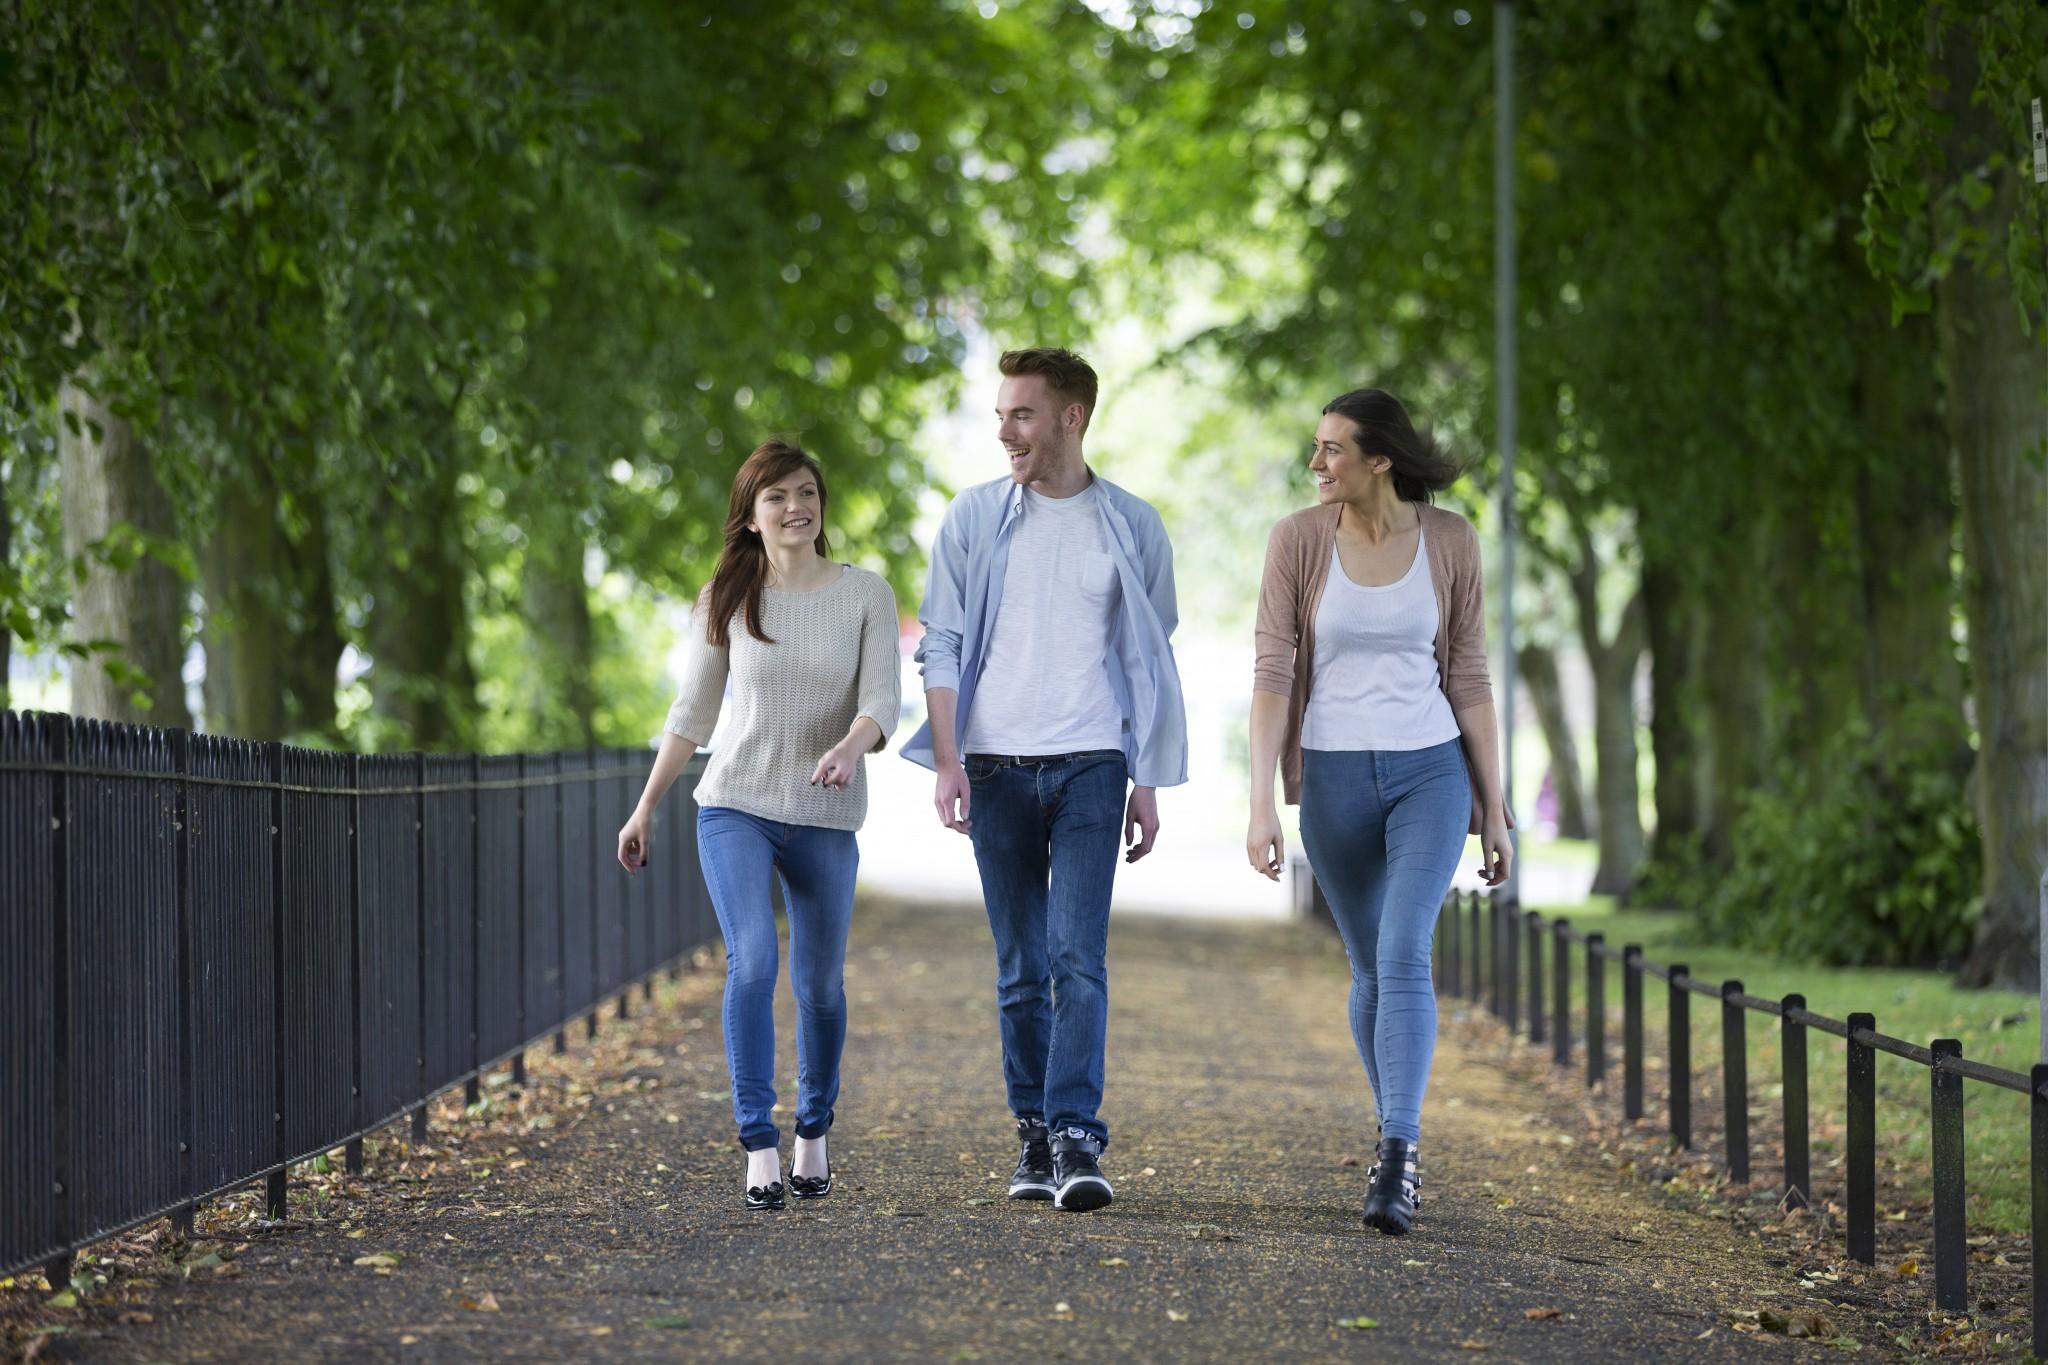 uk-university.jpg